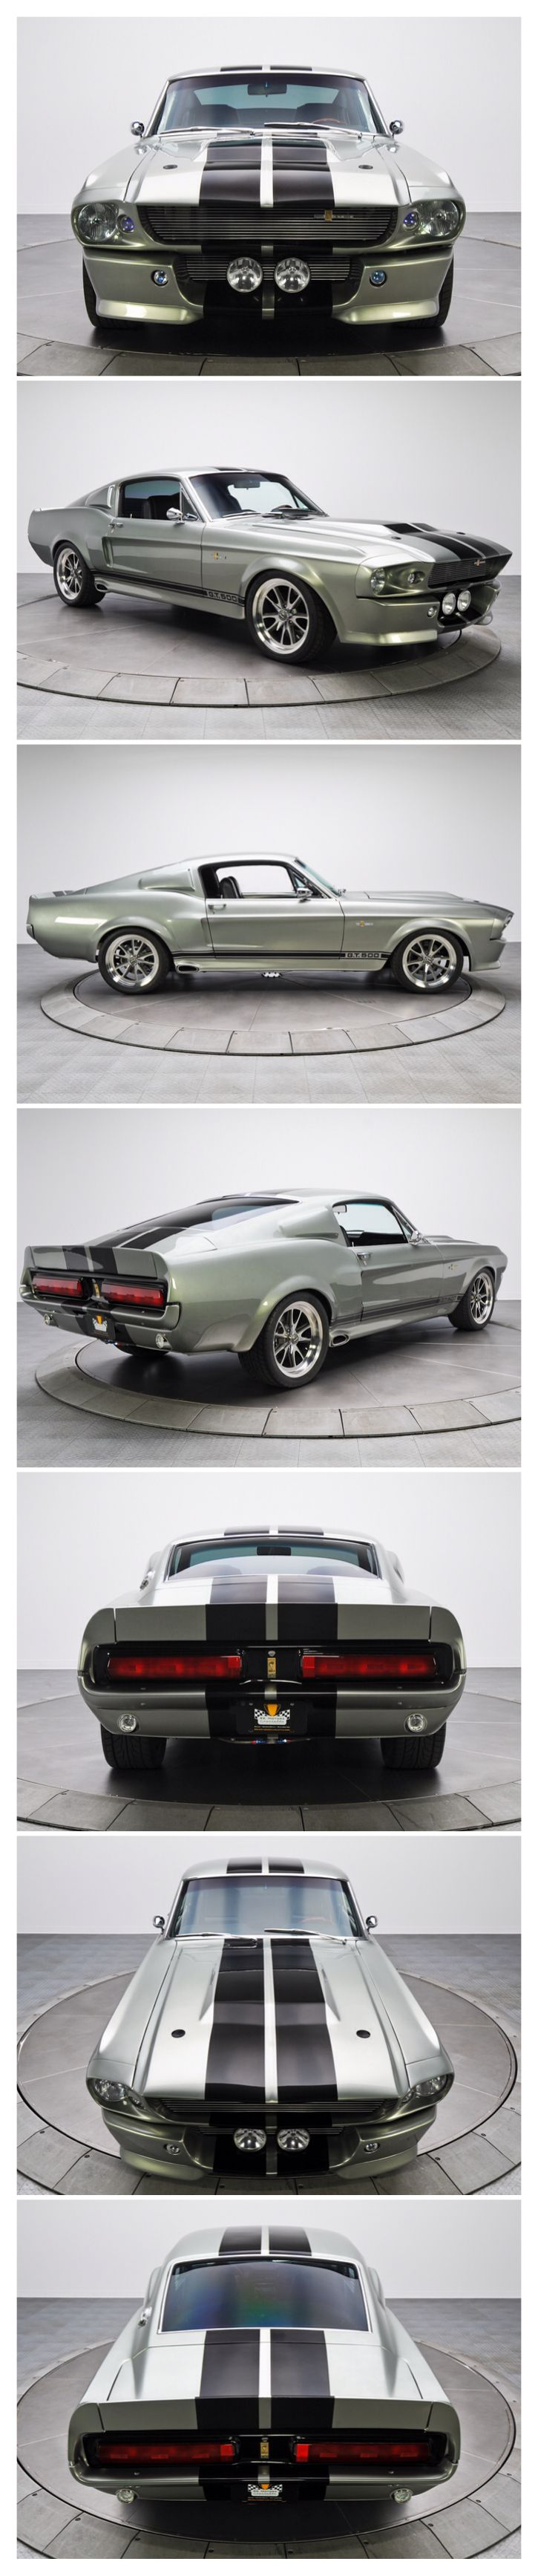 119 best Cars images on Pinterest | Old school cars, Vintage cars ...